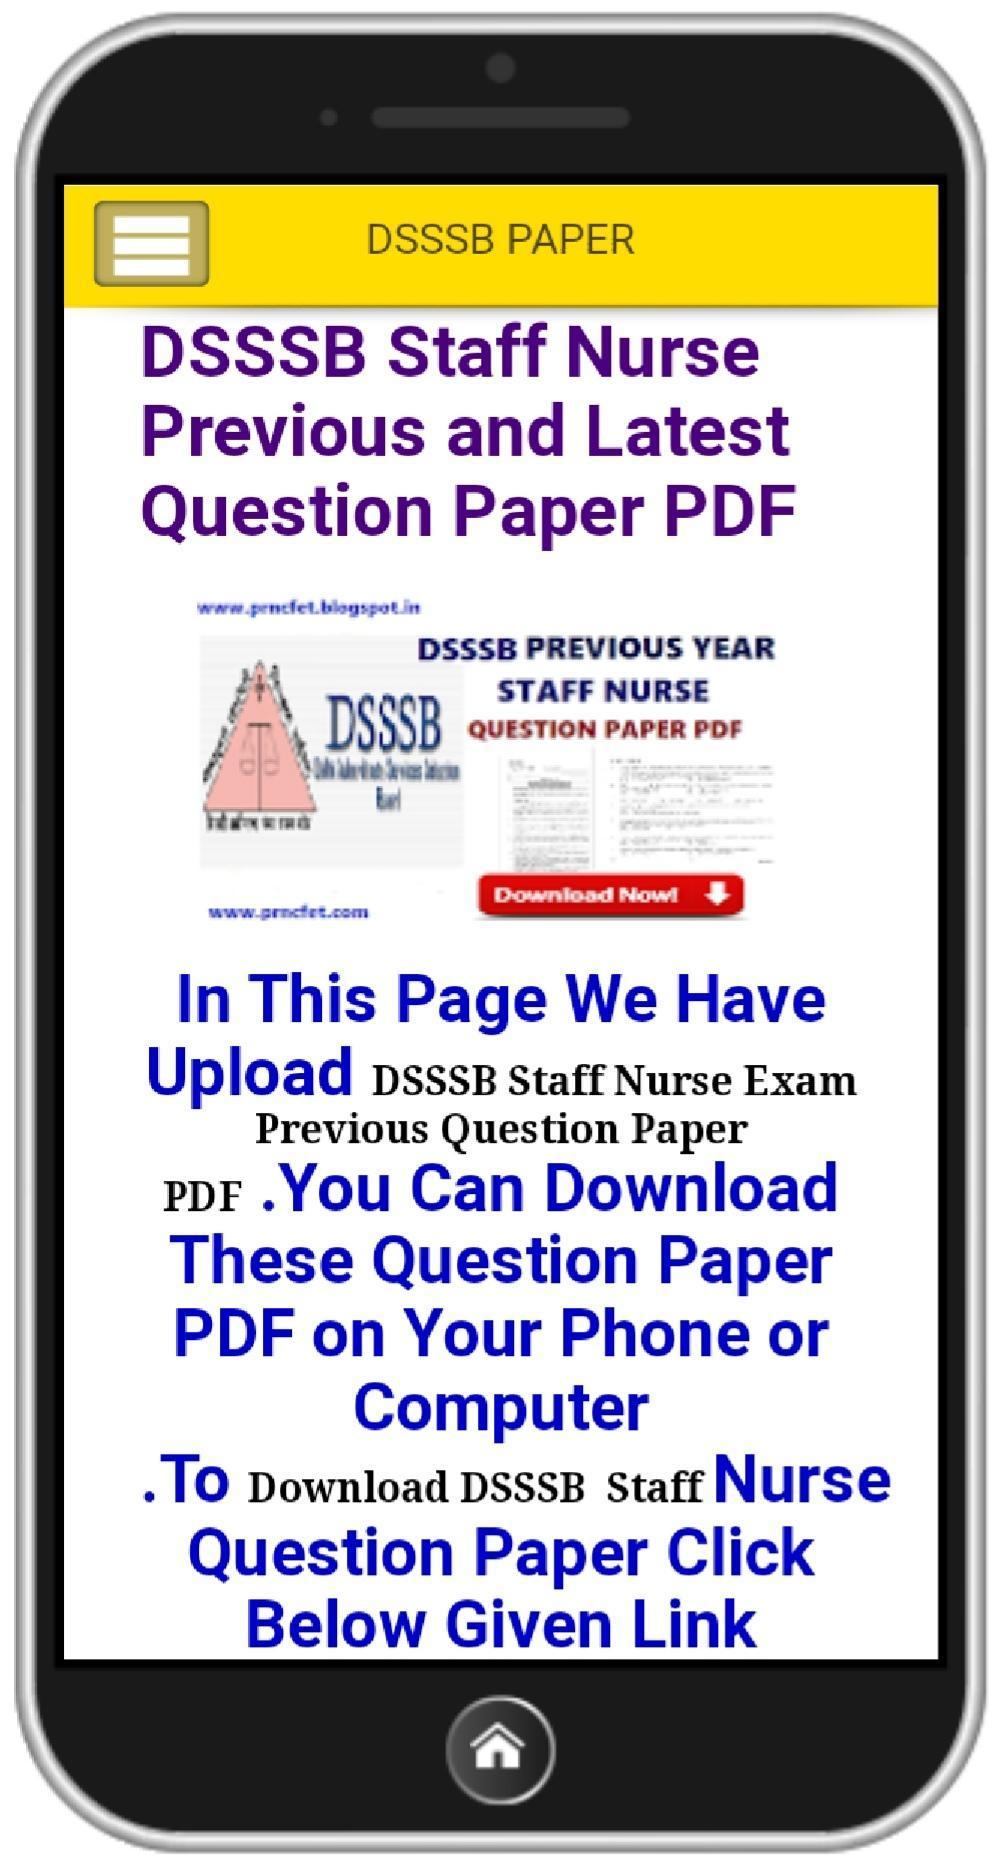 Nursing Paper PDF for Android - APK Download